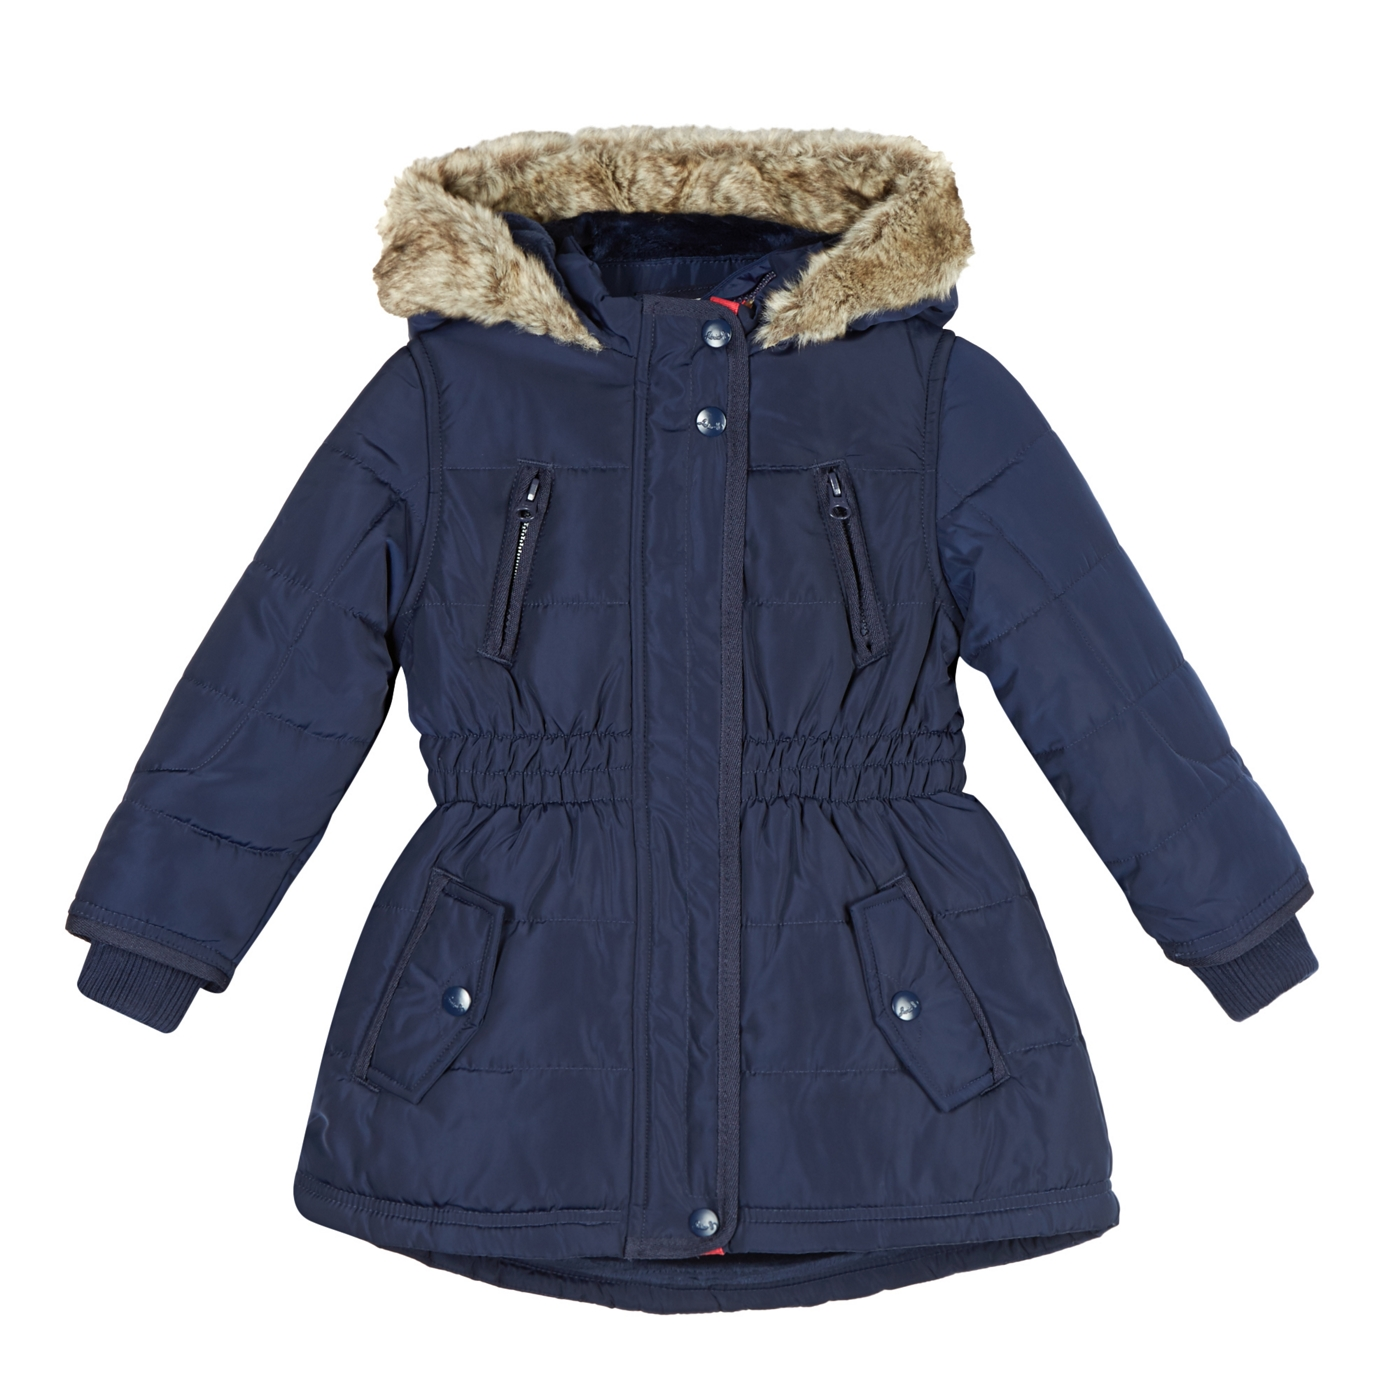 fae0bbe79 J by Jasper Conran Designer girls navy faux fur lined padded coat on ...